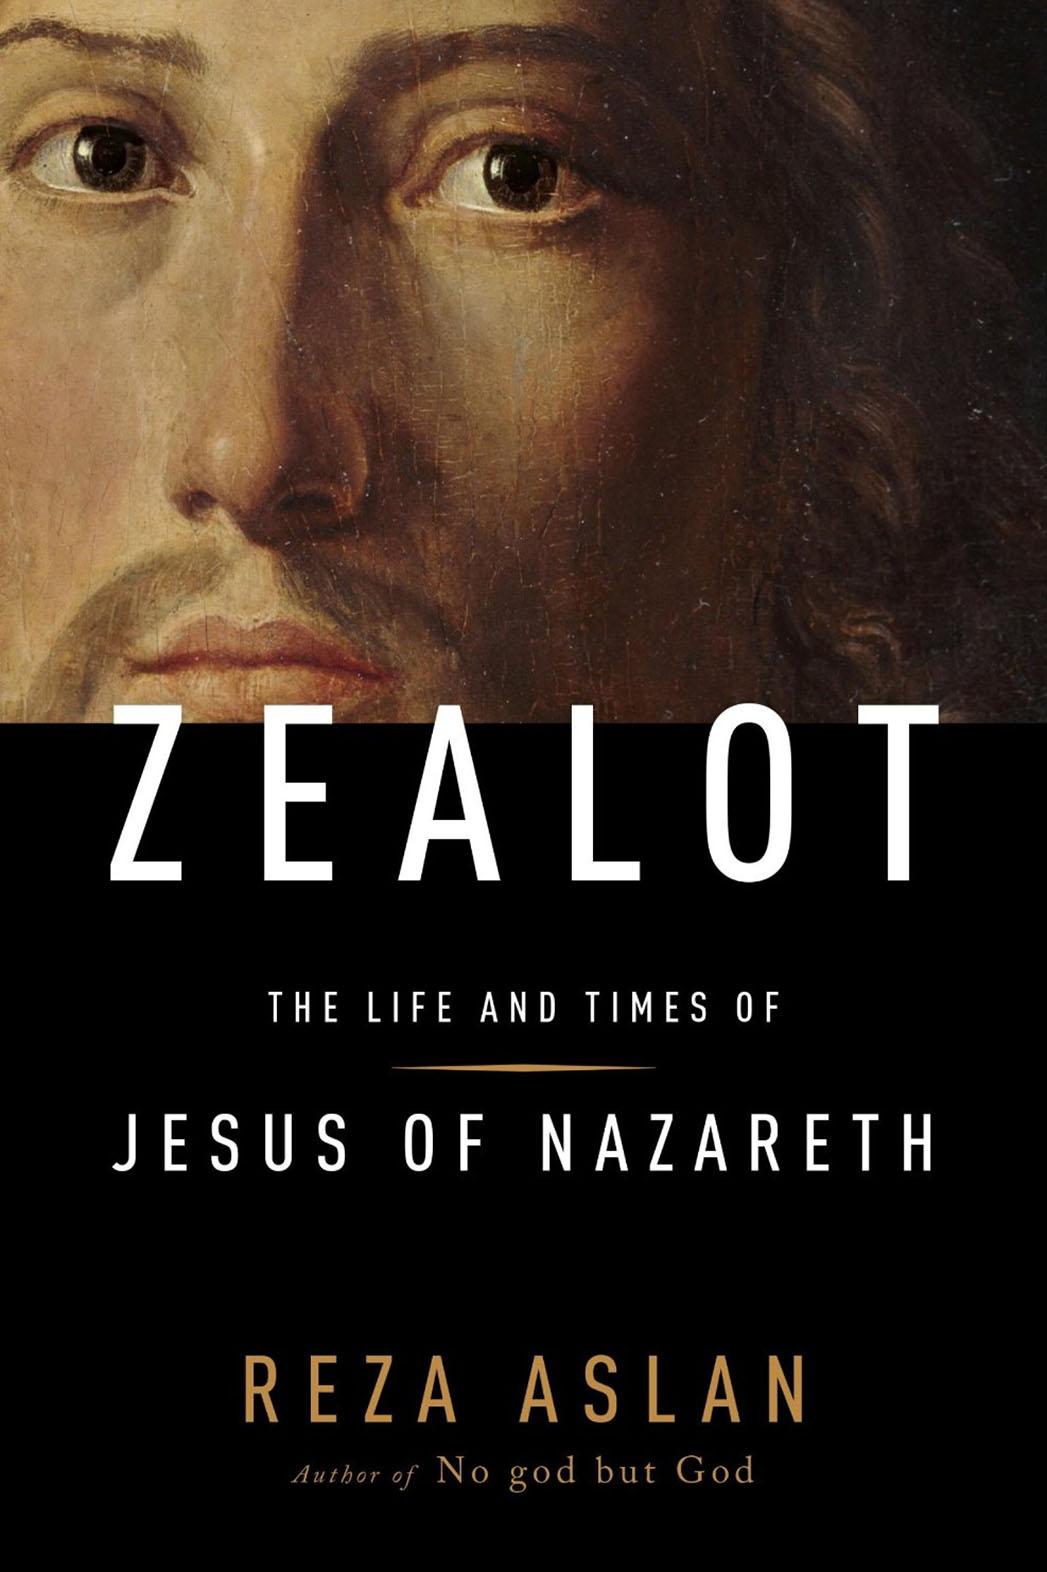 Zealot Cover by Reza Aslan - P 2013